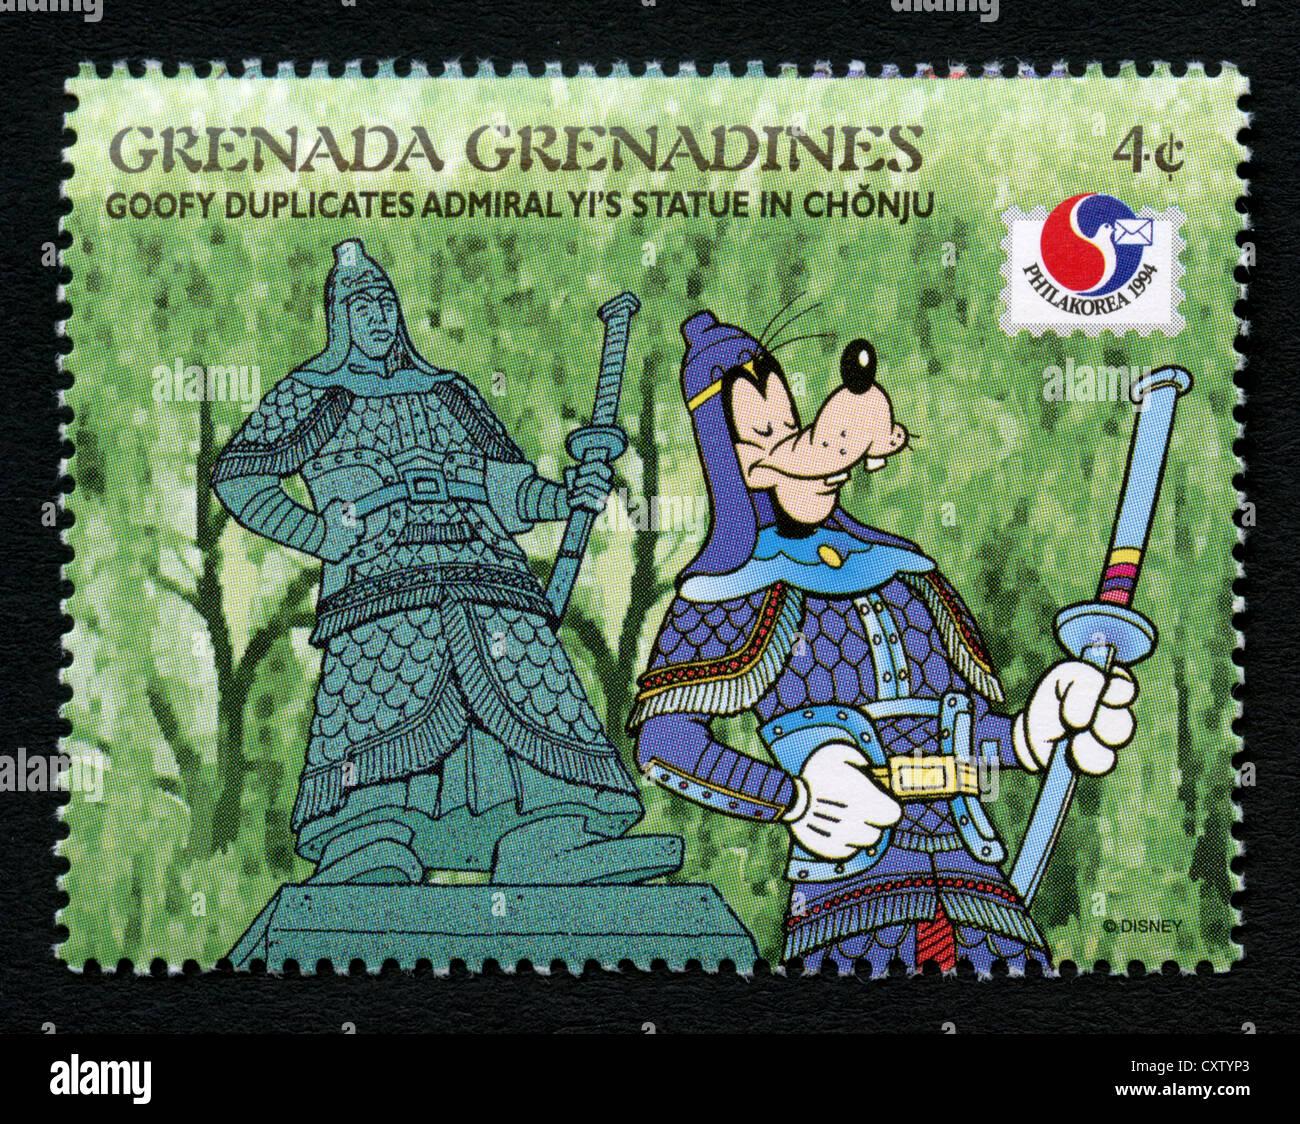 Grenada postage stamp - Disney cartoon characters - Goofy - Stock Image